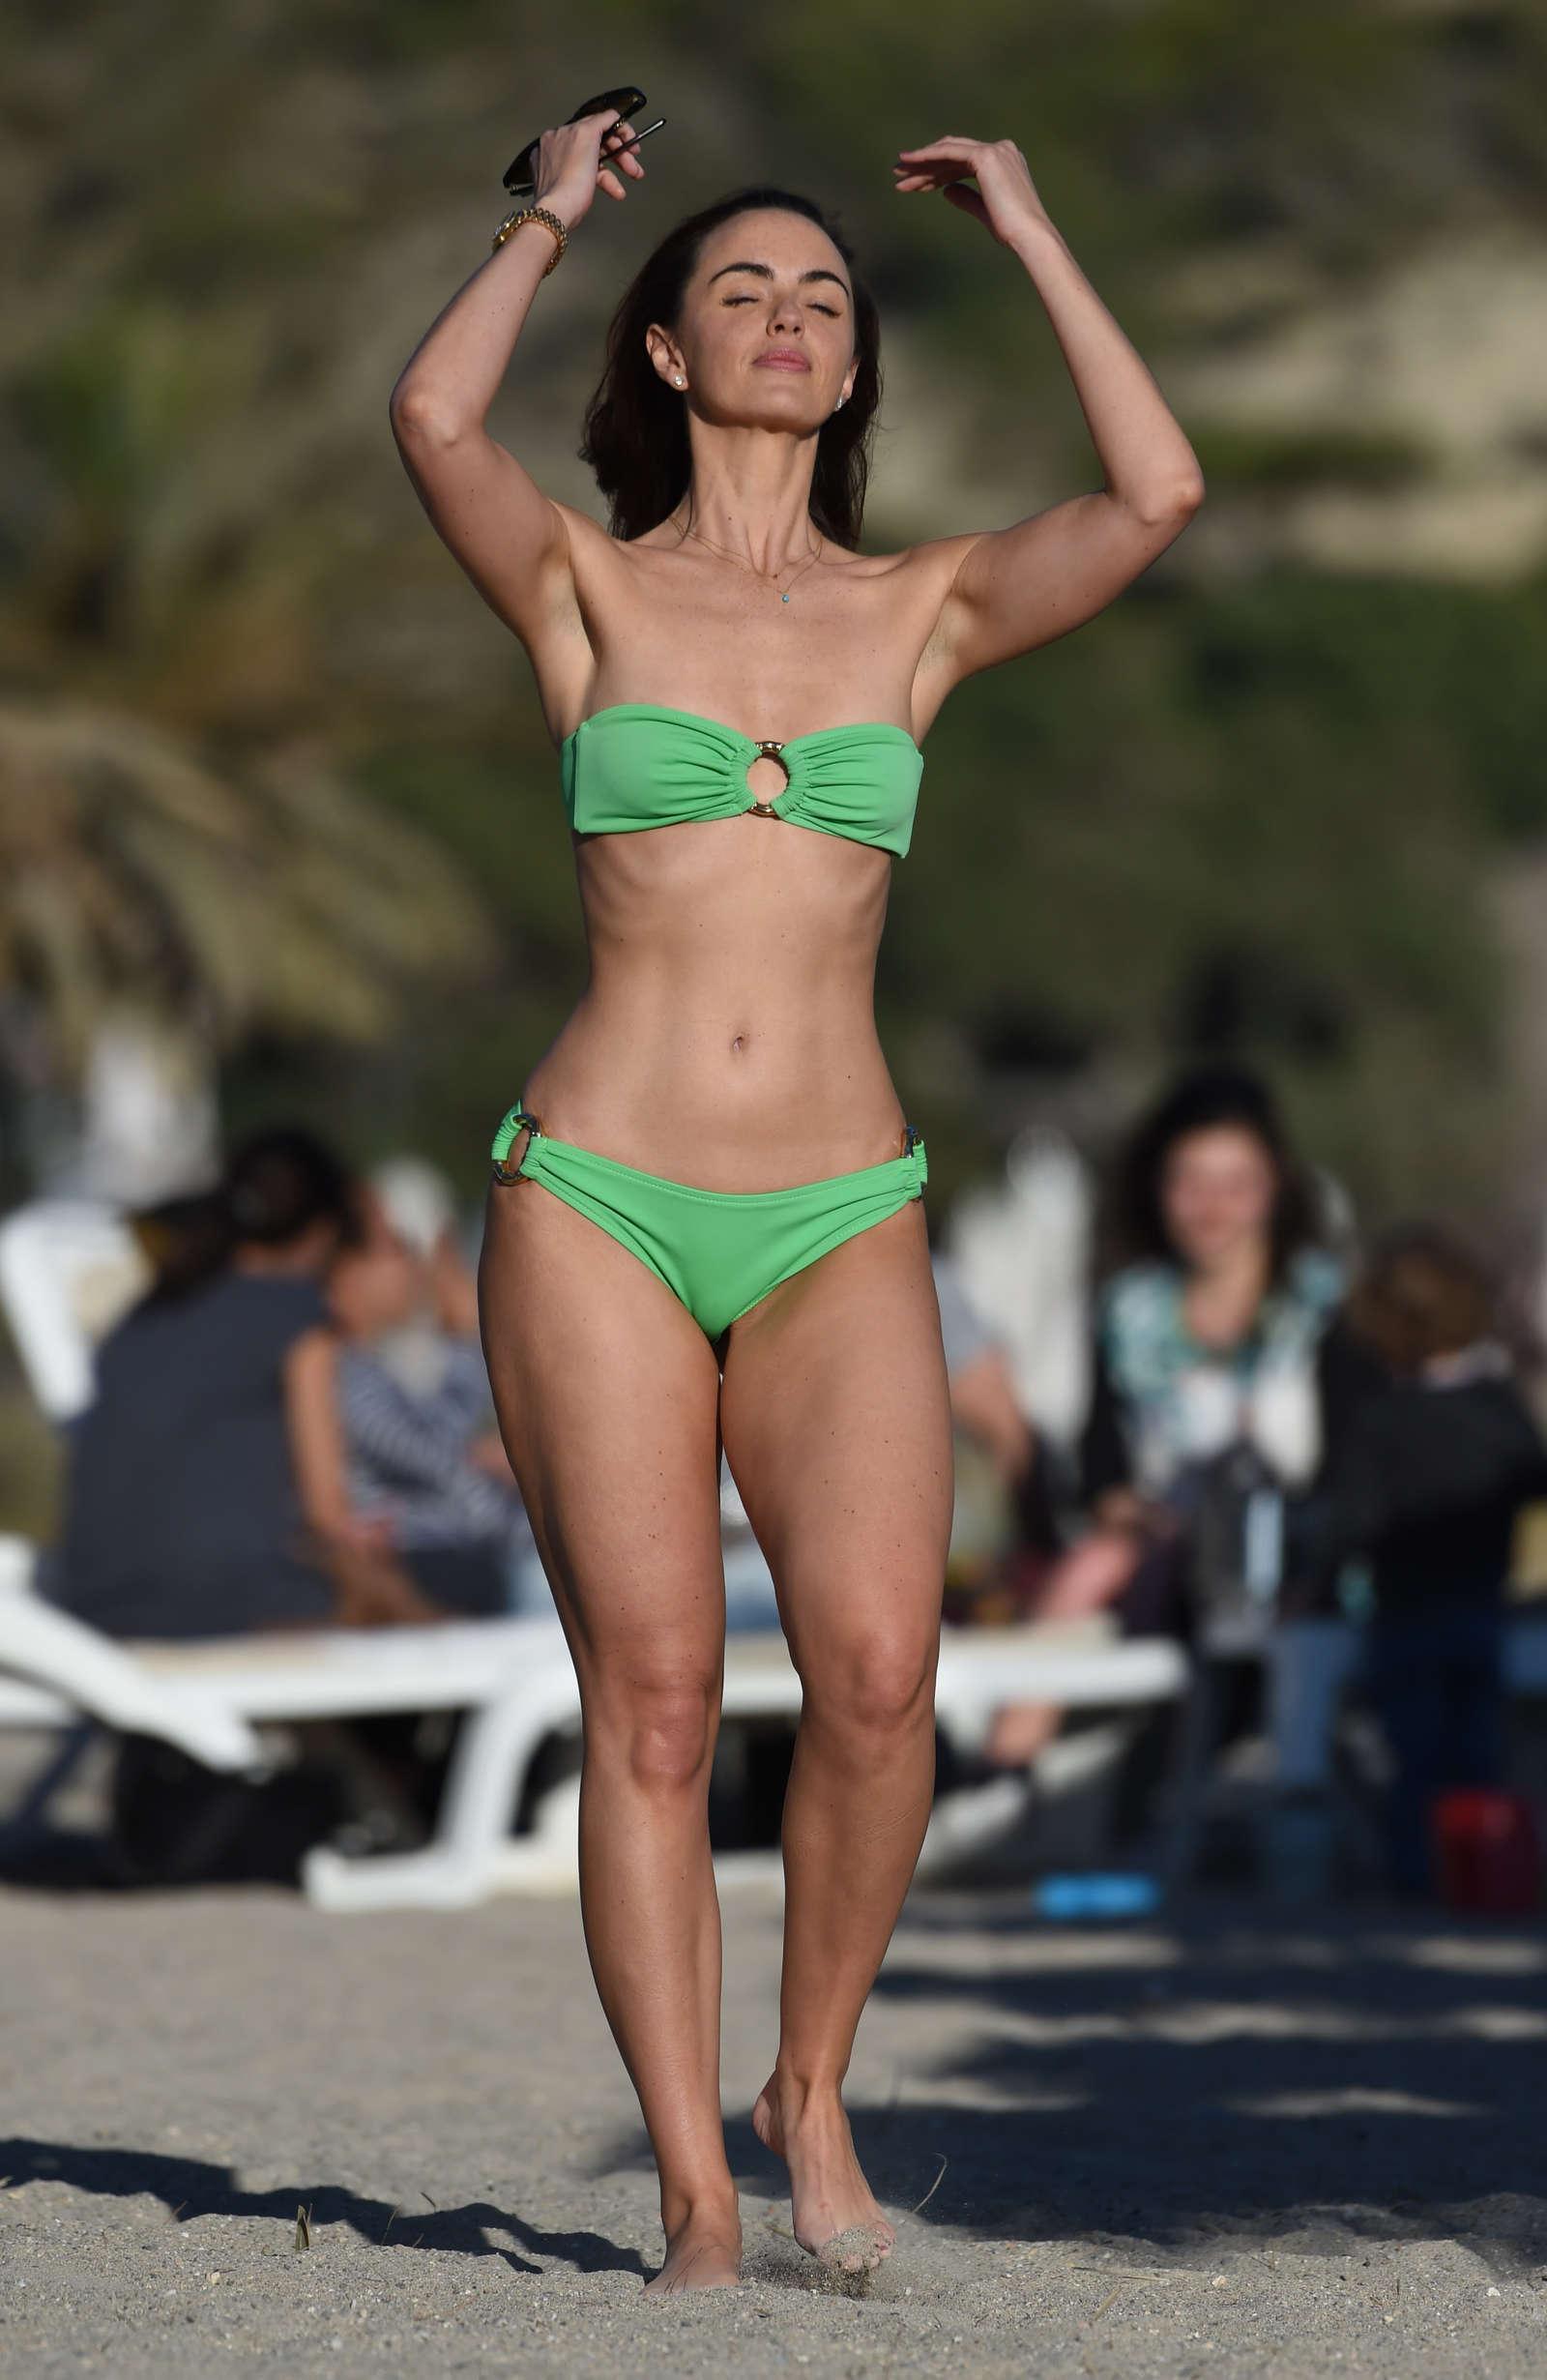 Bikini Jennifer Metcalfe nude (92 photo), Tits, Hot, Boobs, butt 2018